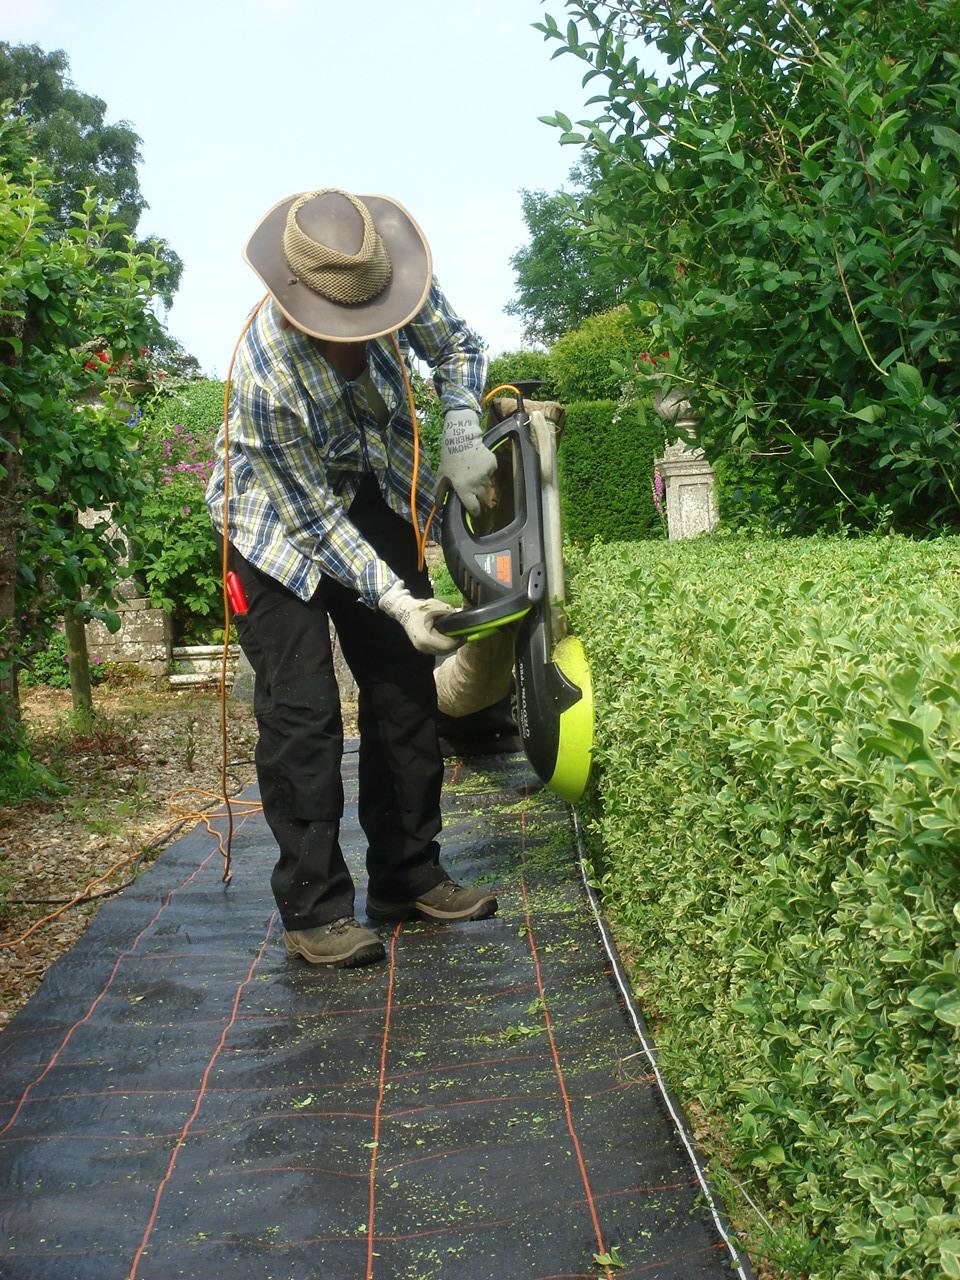 Millie using the 'Garden Groom' hedge trimmer during her gardening apprenticeship. Image supplied by Millie.